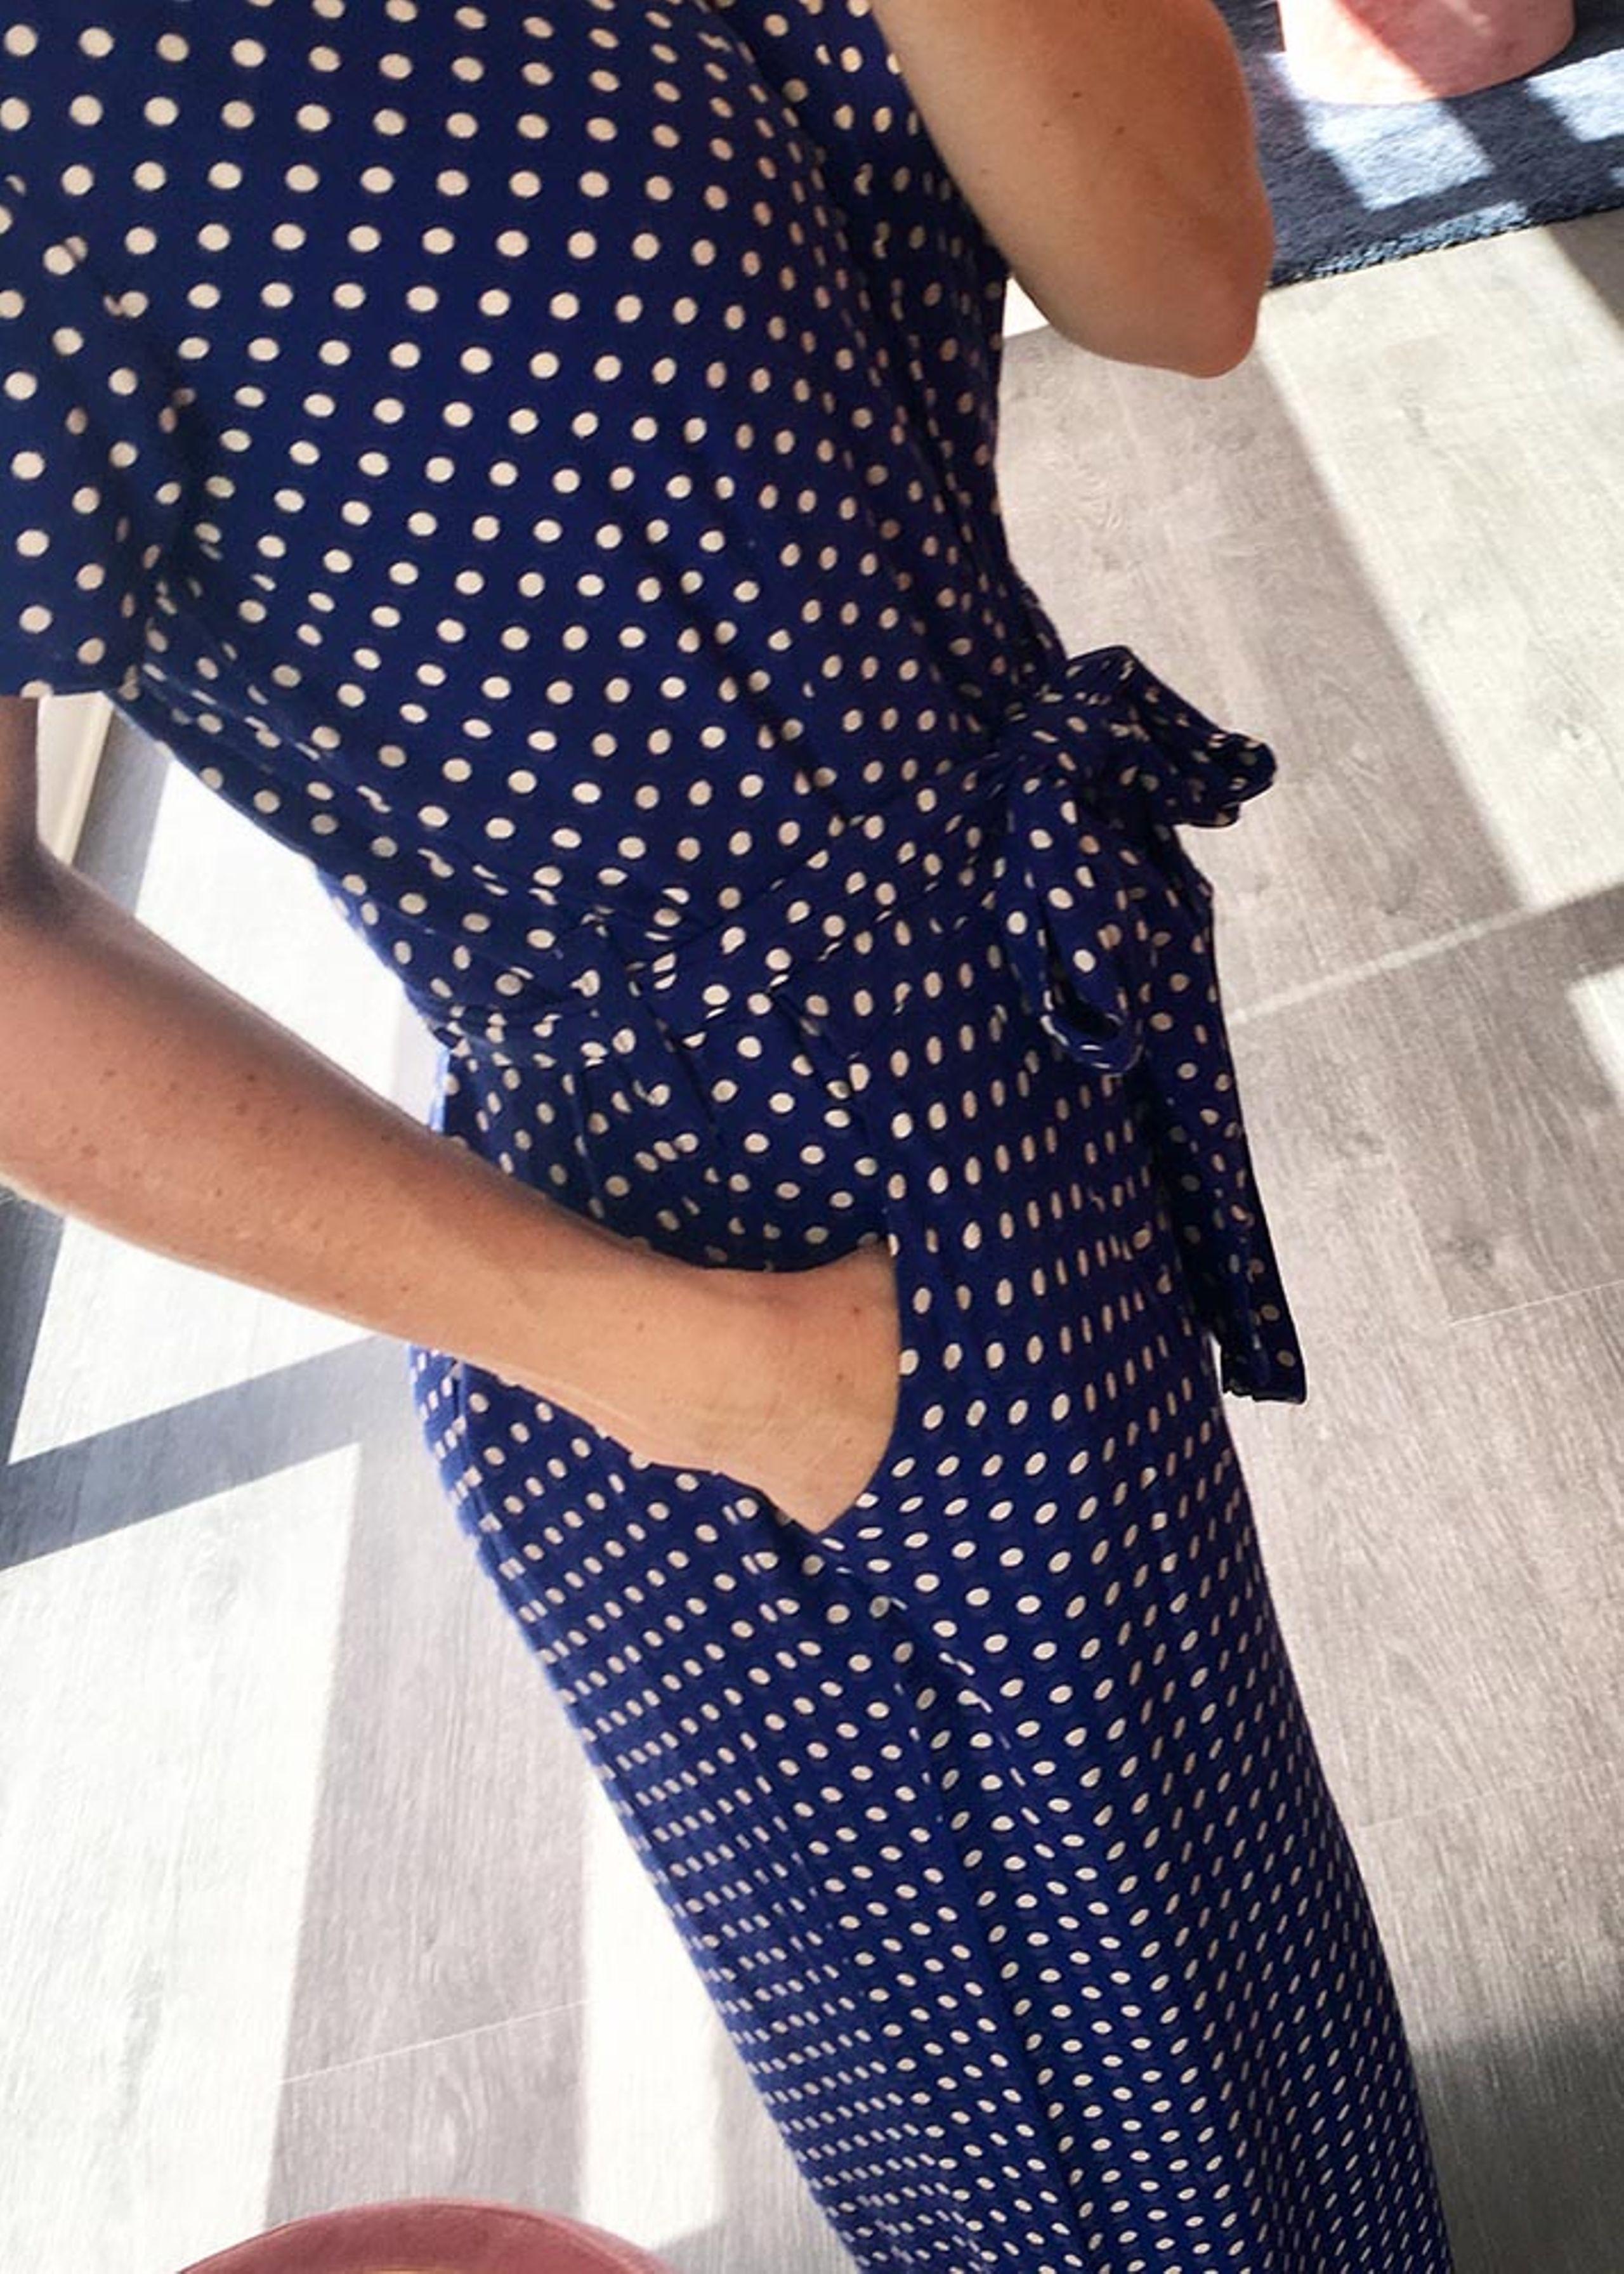 Jumpsuit kjole med polkaprikker   Kjoler, Jumpsuits og